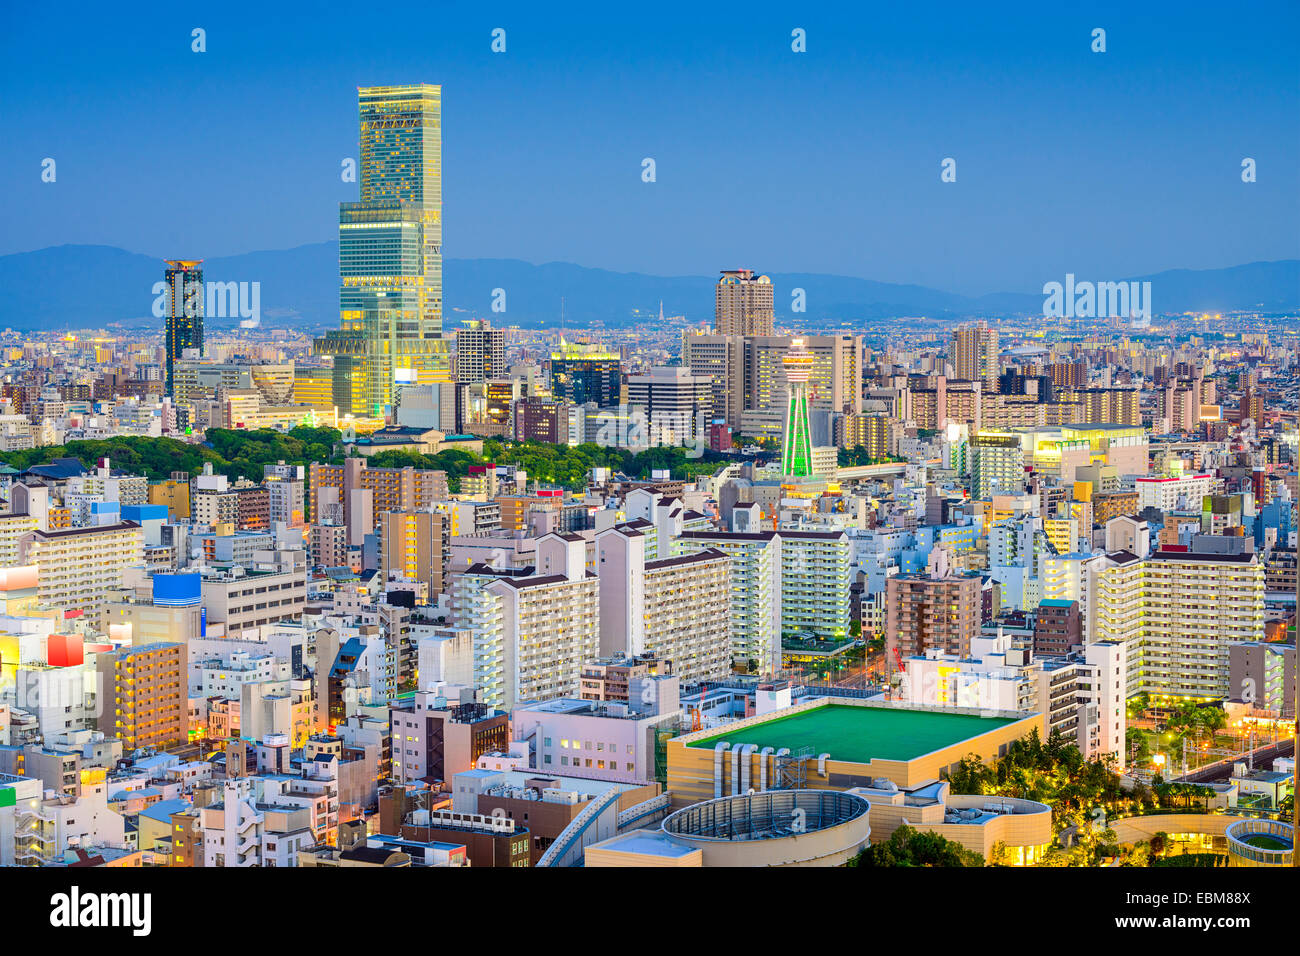 Osaka, Japan Stadtbild Ansicht von Abeno und Shinsekai Bezirk. Stockbild